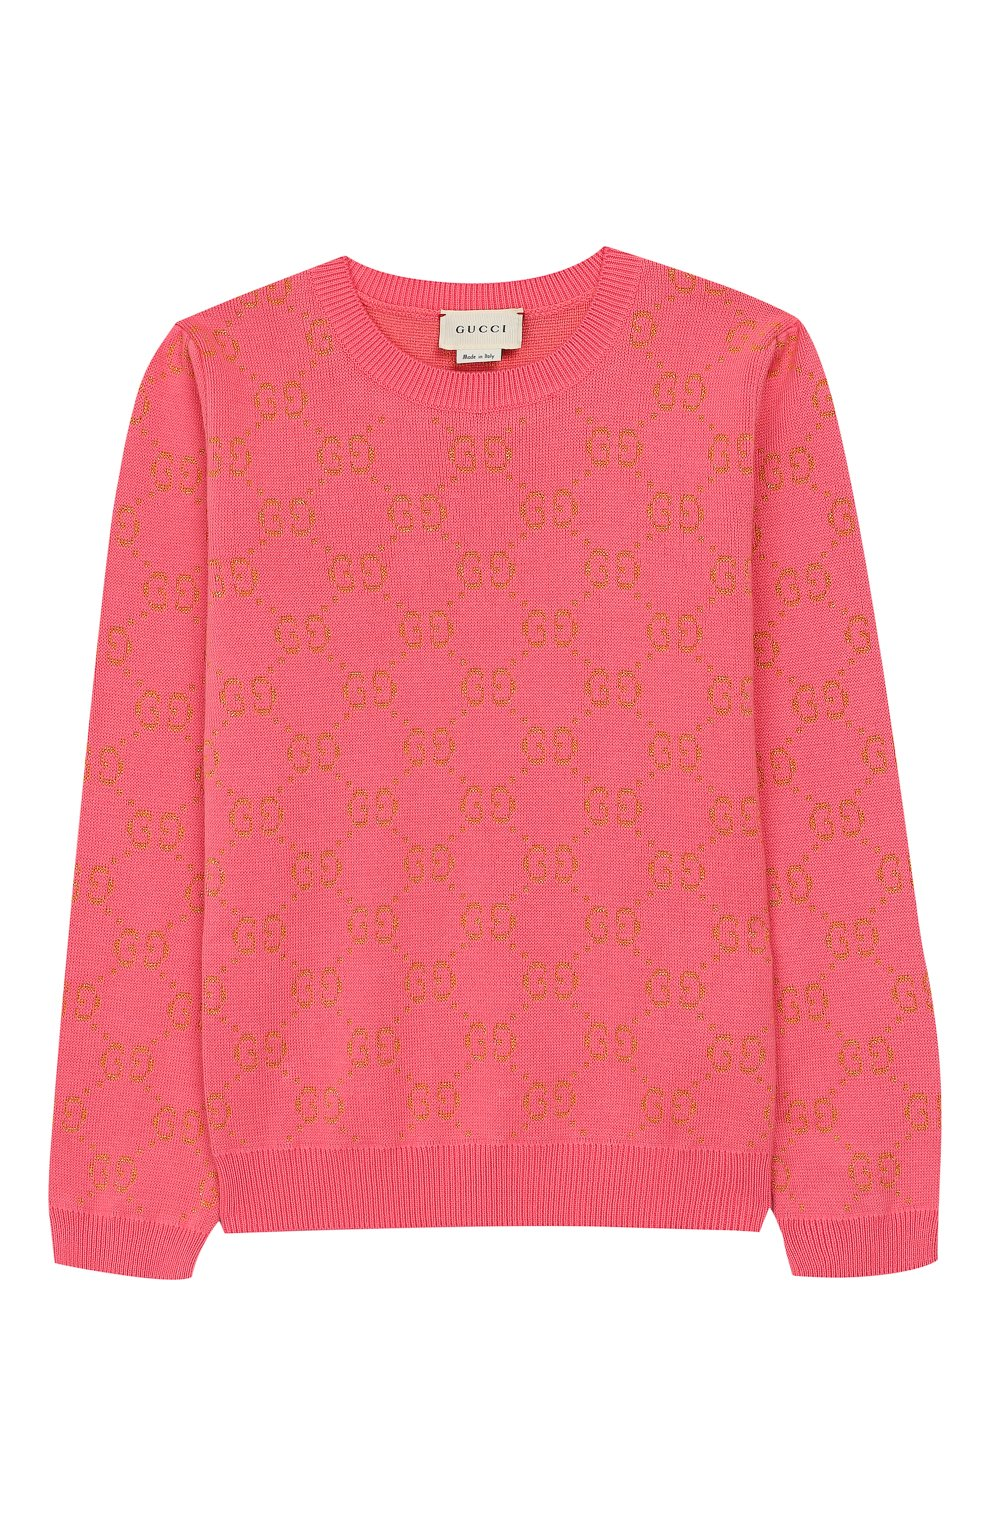 Детский хлопковый пуловер GUCCI розового цвета, арт. 571723/XKAHM | Фото 1